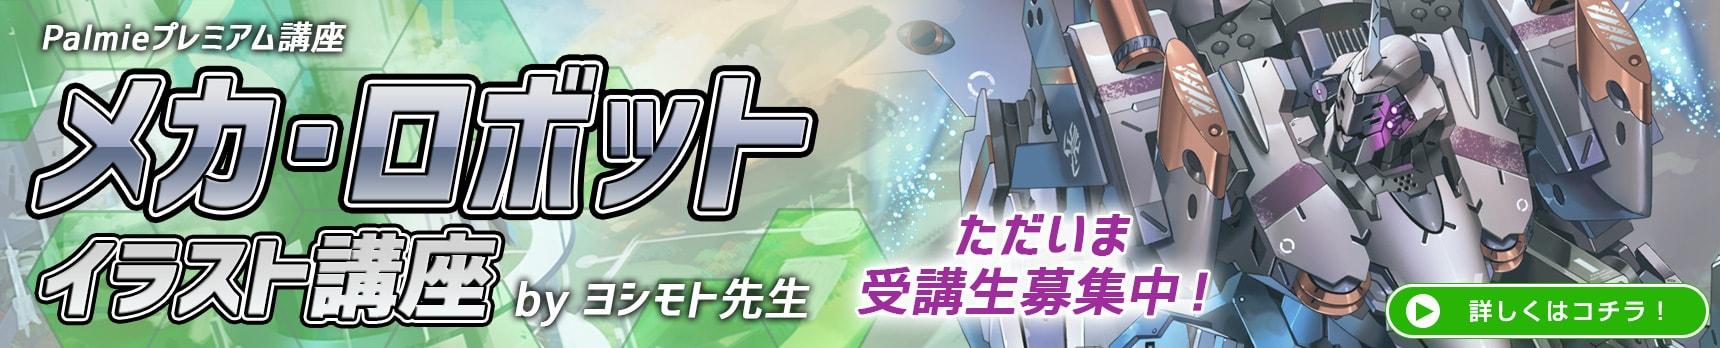 Yoshimoto banner pc